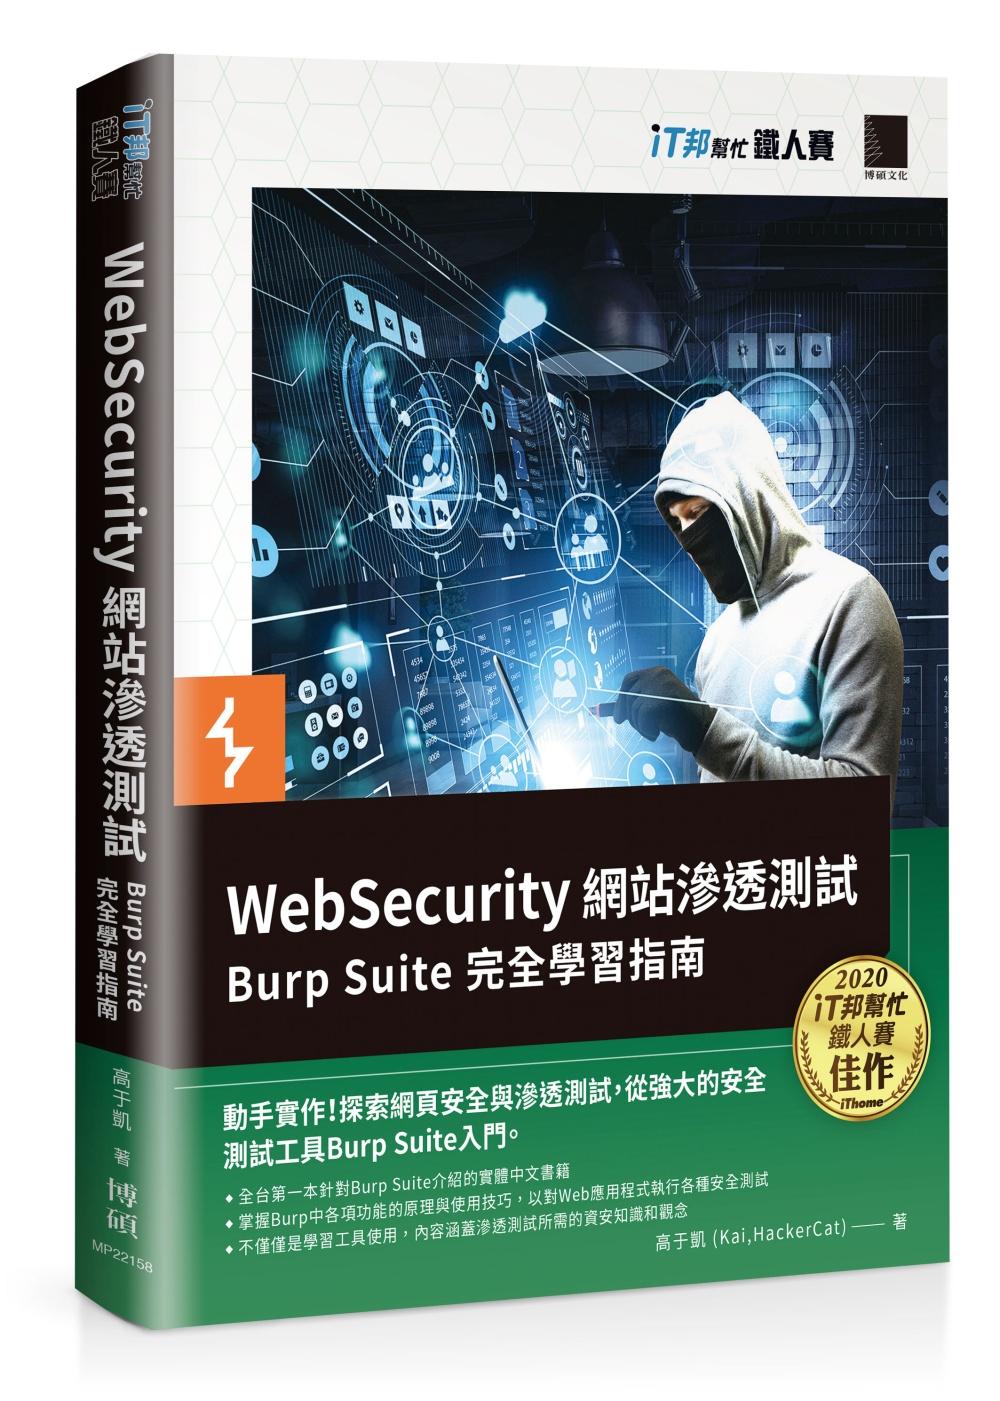 WebSecurity 網站滲...